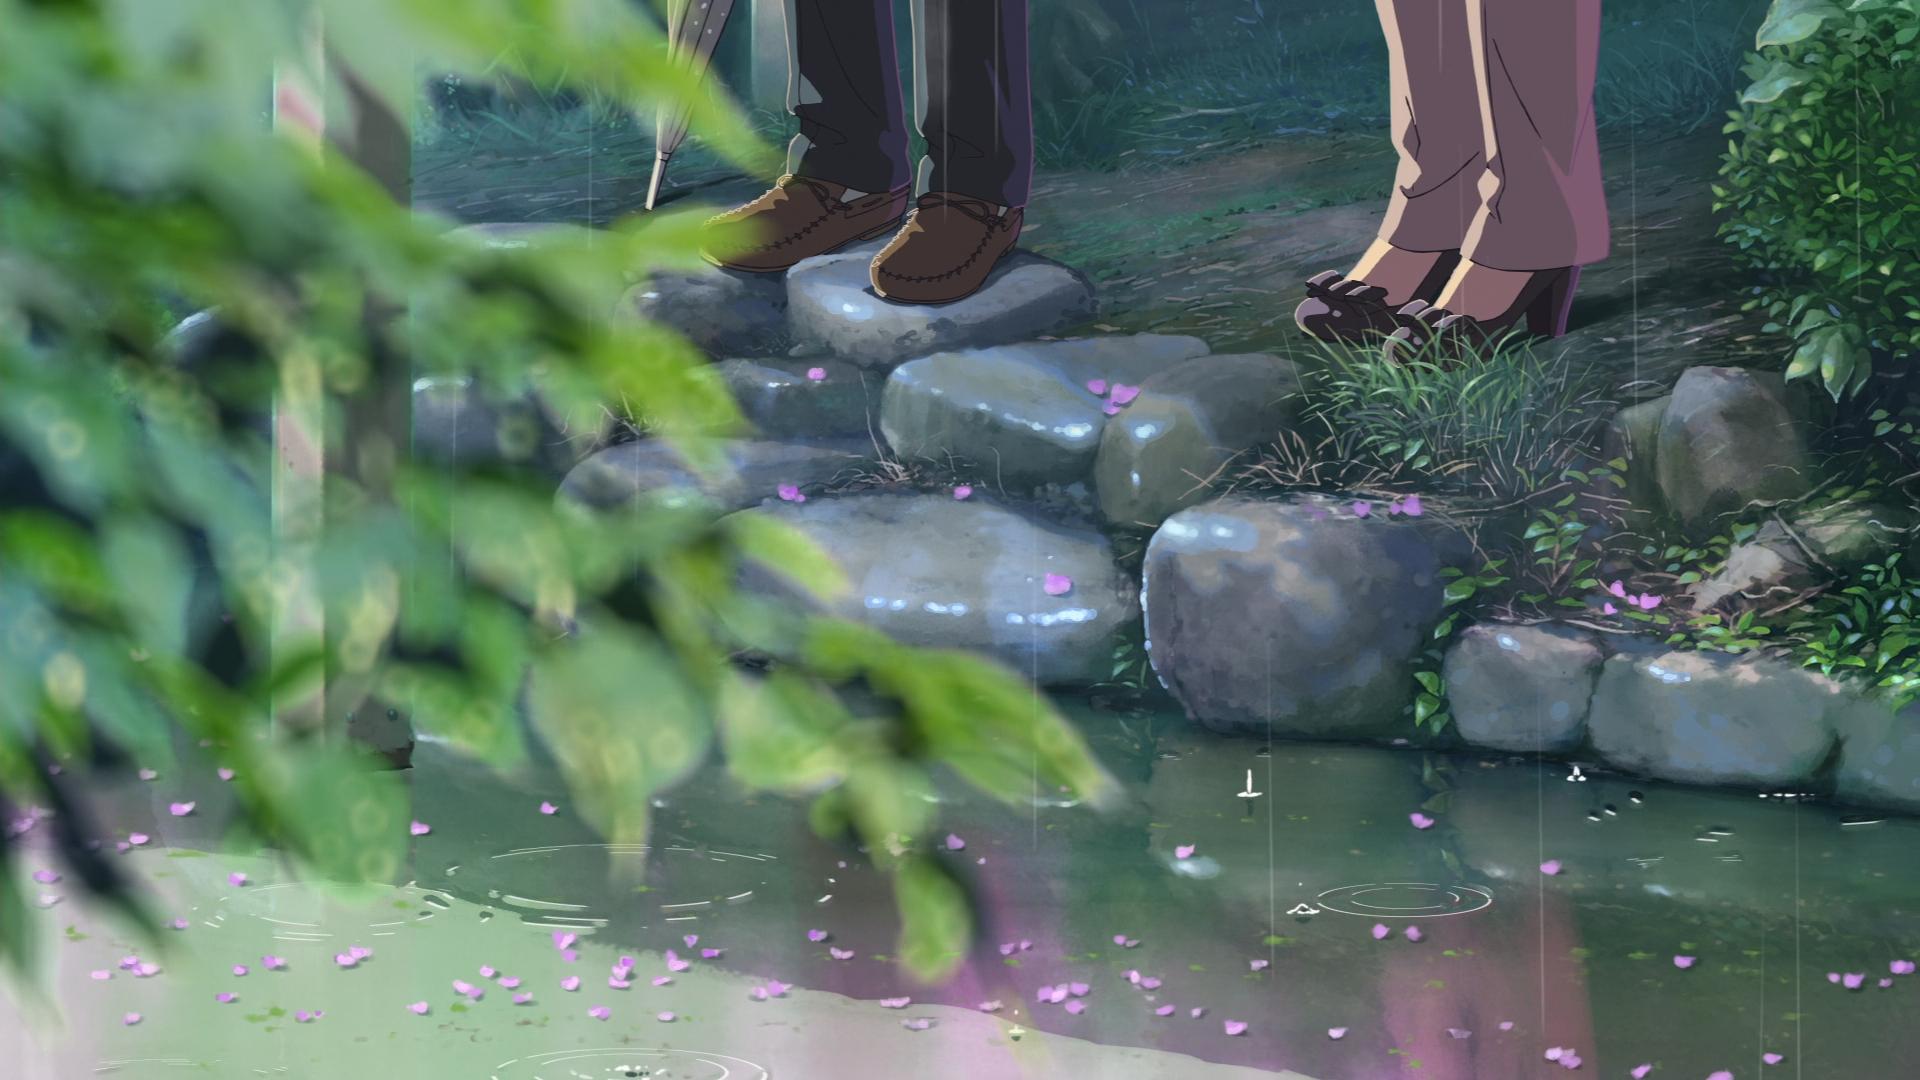 The Garden Of Words Makoto Shinkai Wallpaper 42699926 Fanpop